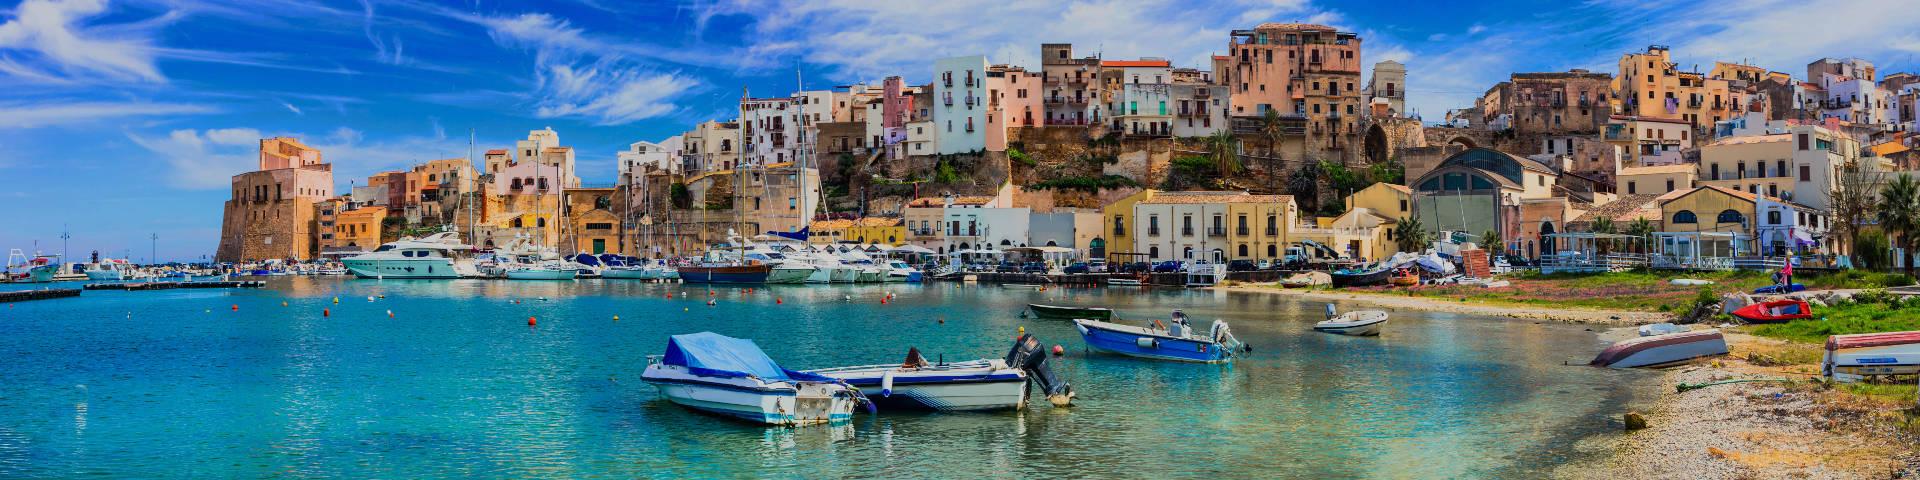 Sicily hero